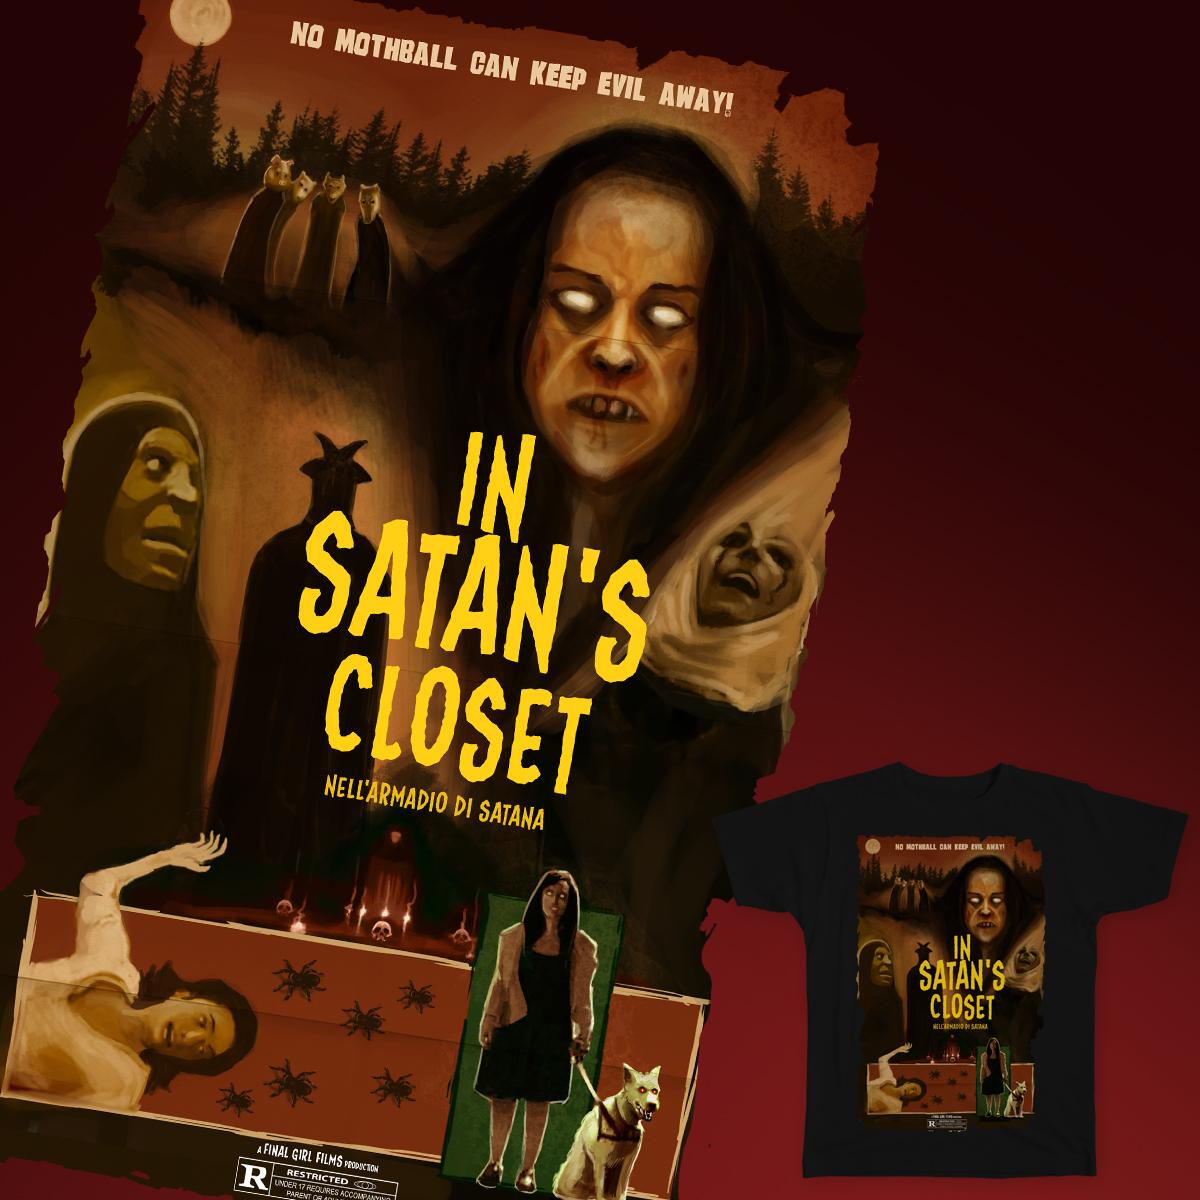 In Satan's Closet by chuckramos and FinalGirl on Threadless